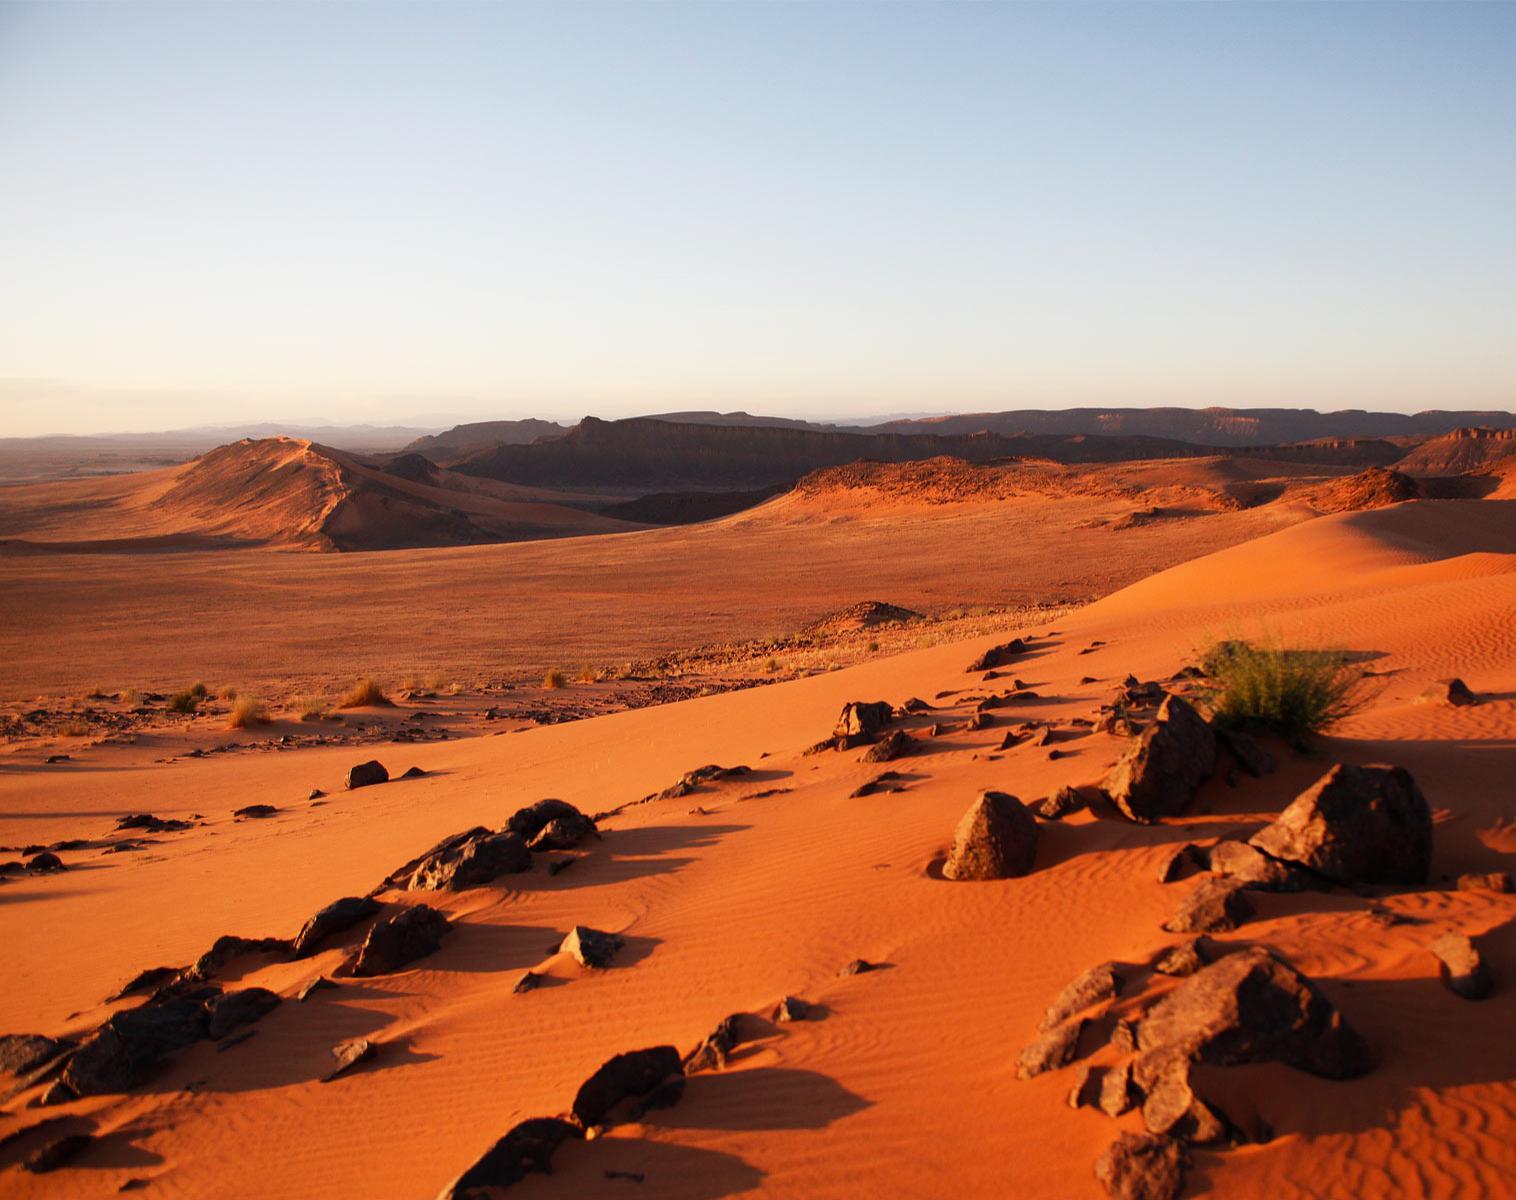 Maroc  Djebel Zireg, immersion saharienne   Trek & Randonnée